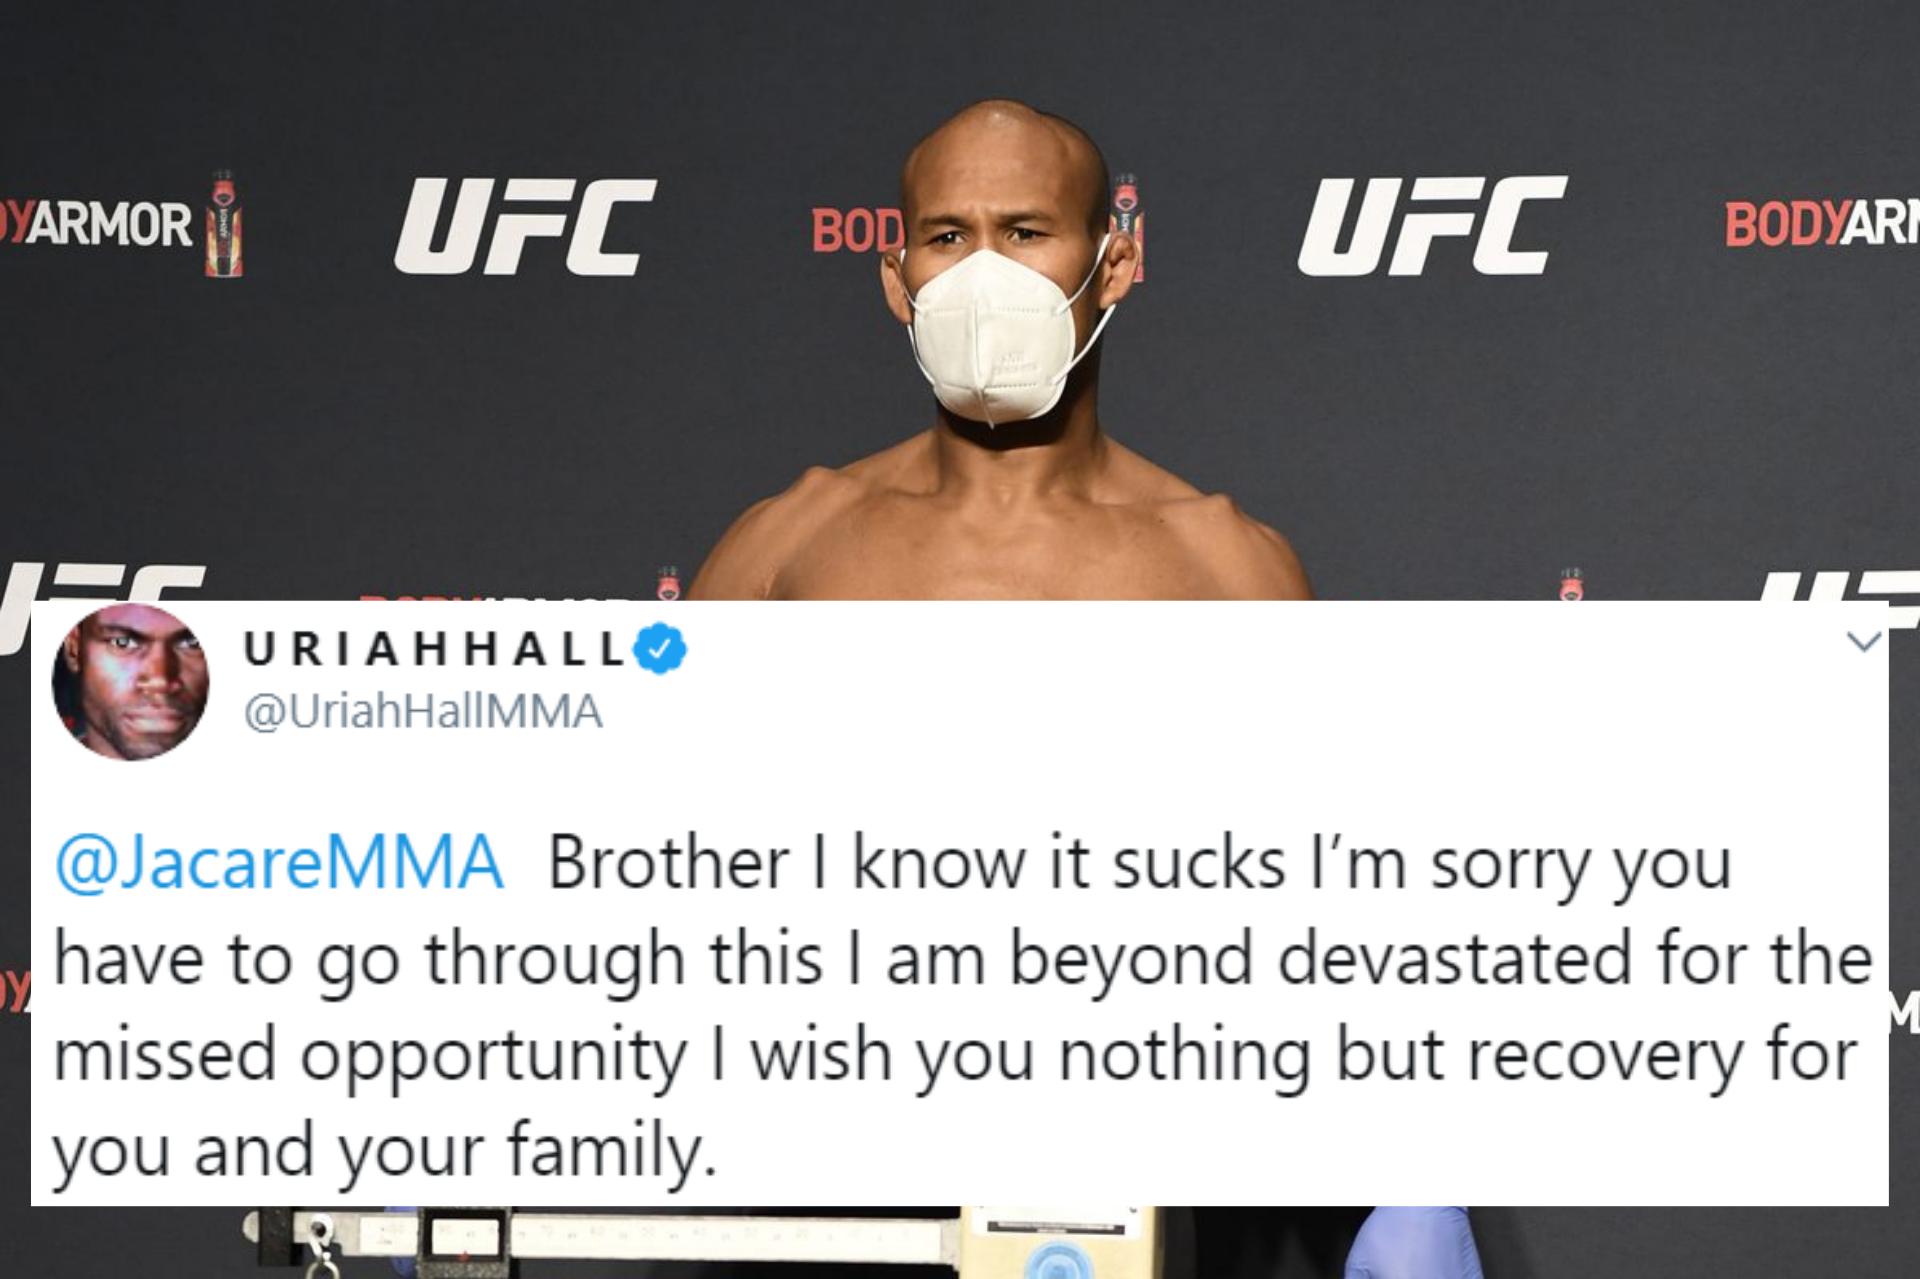 Twitter loses its mind as UFC 249 proceeds despite Jacare Souza testing Covid-19 positive - Jacare Souza